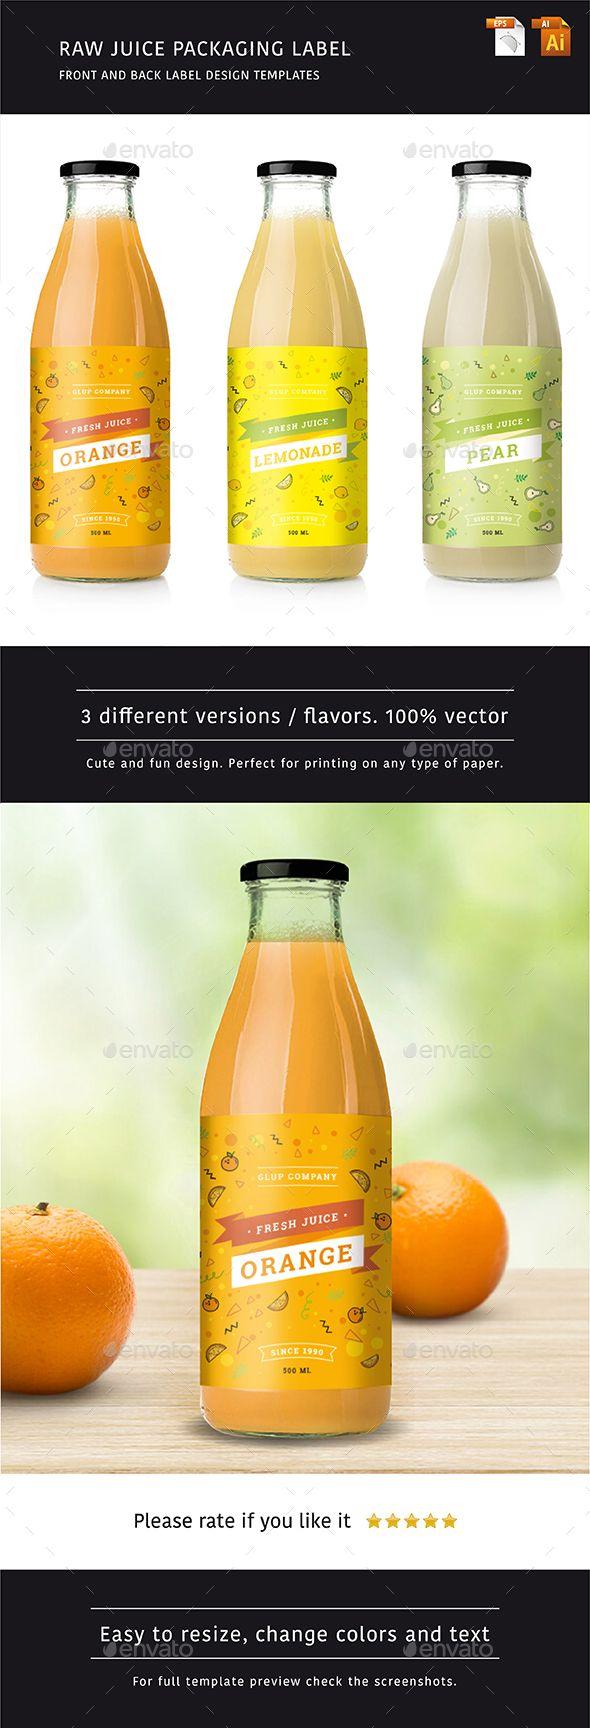 Raw Juice Label Design Template - 3 Flavors - Vector EPS, AI Illustrator